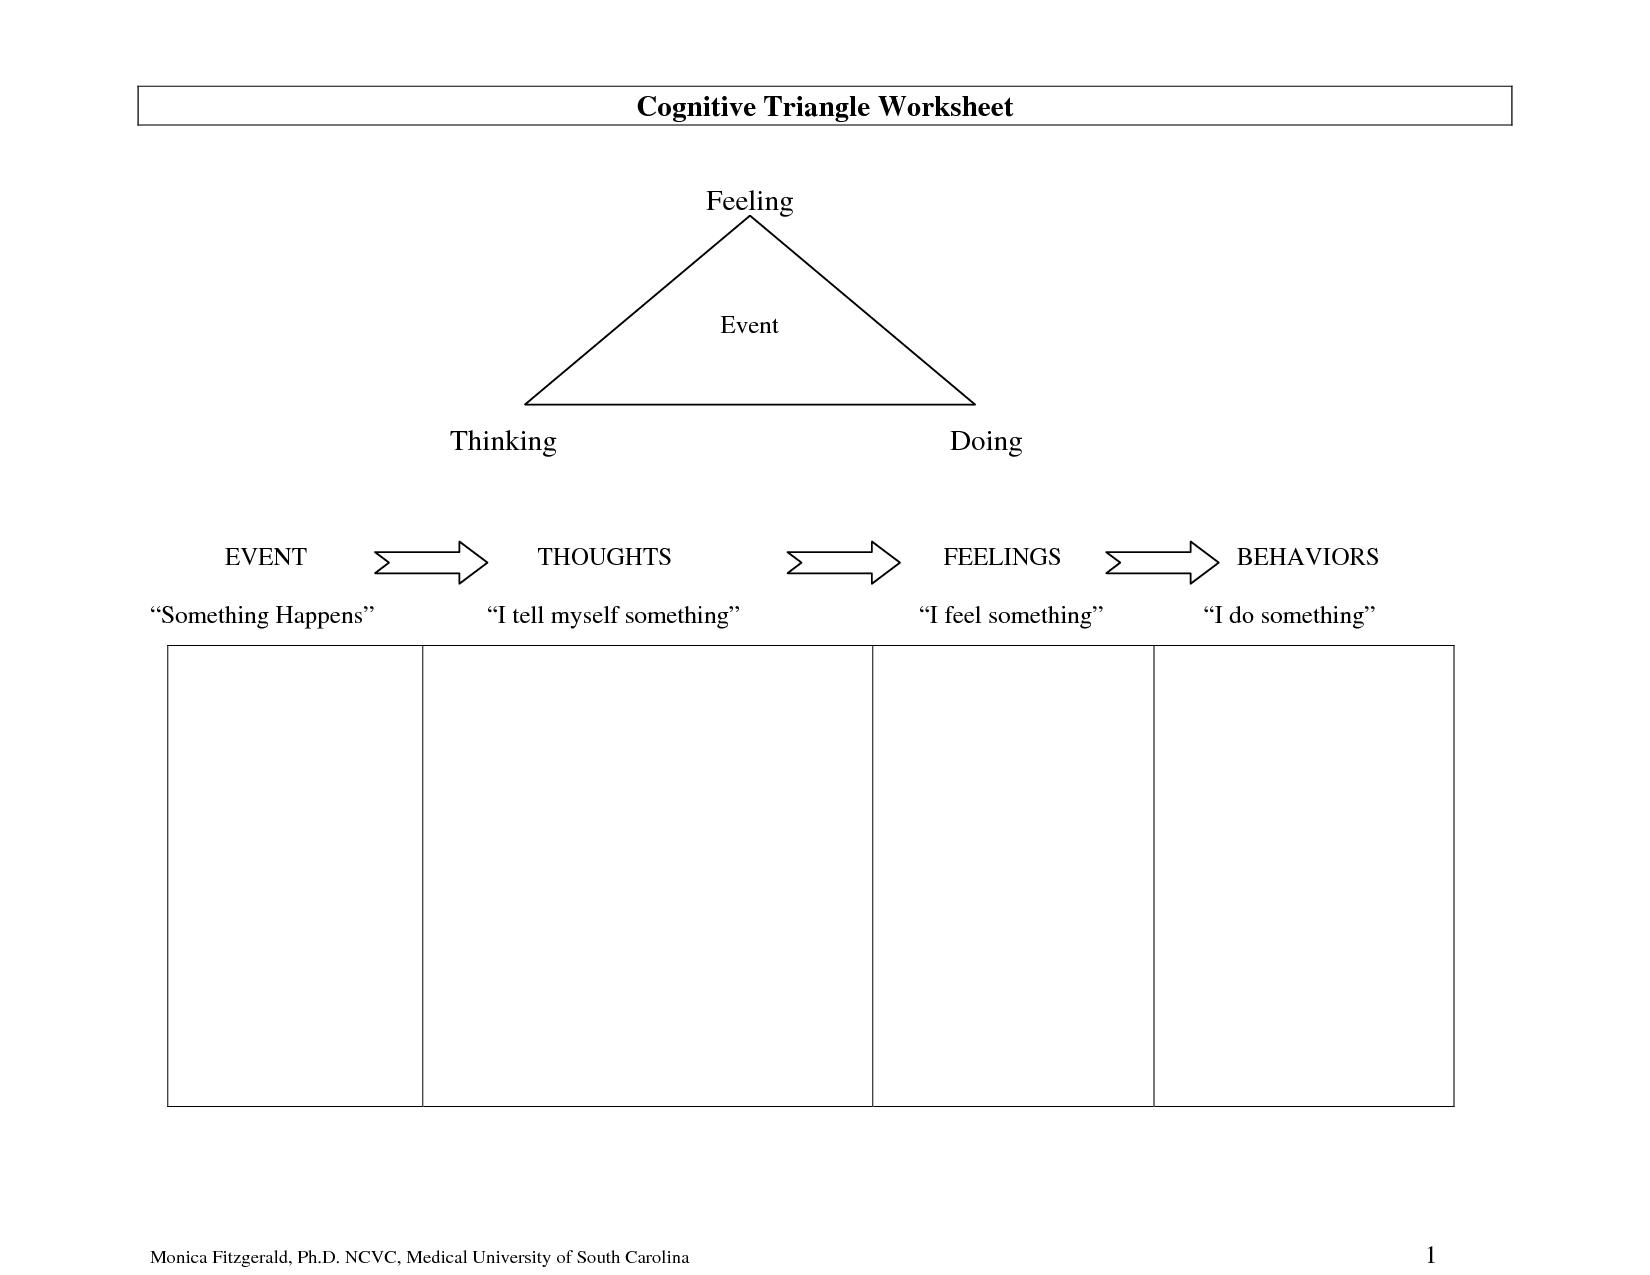 Full Size Printable Feelings Worksheets | Cognitive Triangle | Cbt Printable Worksheets